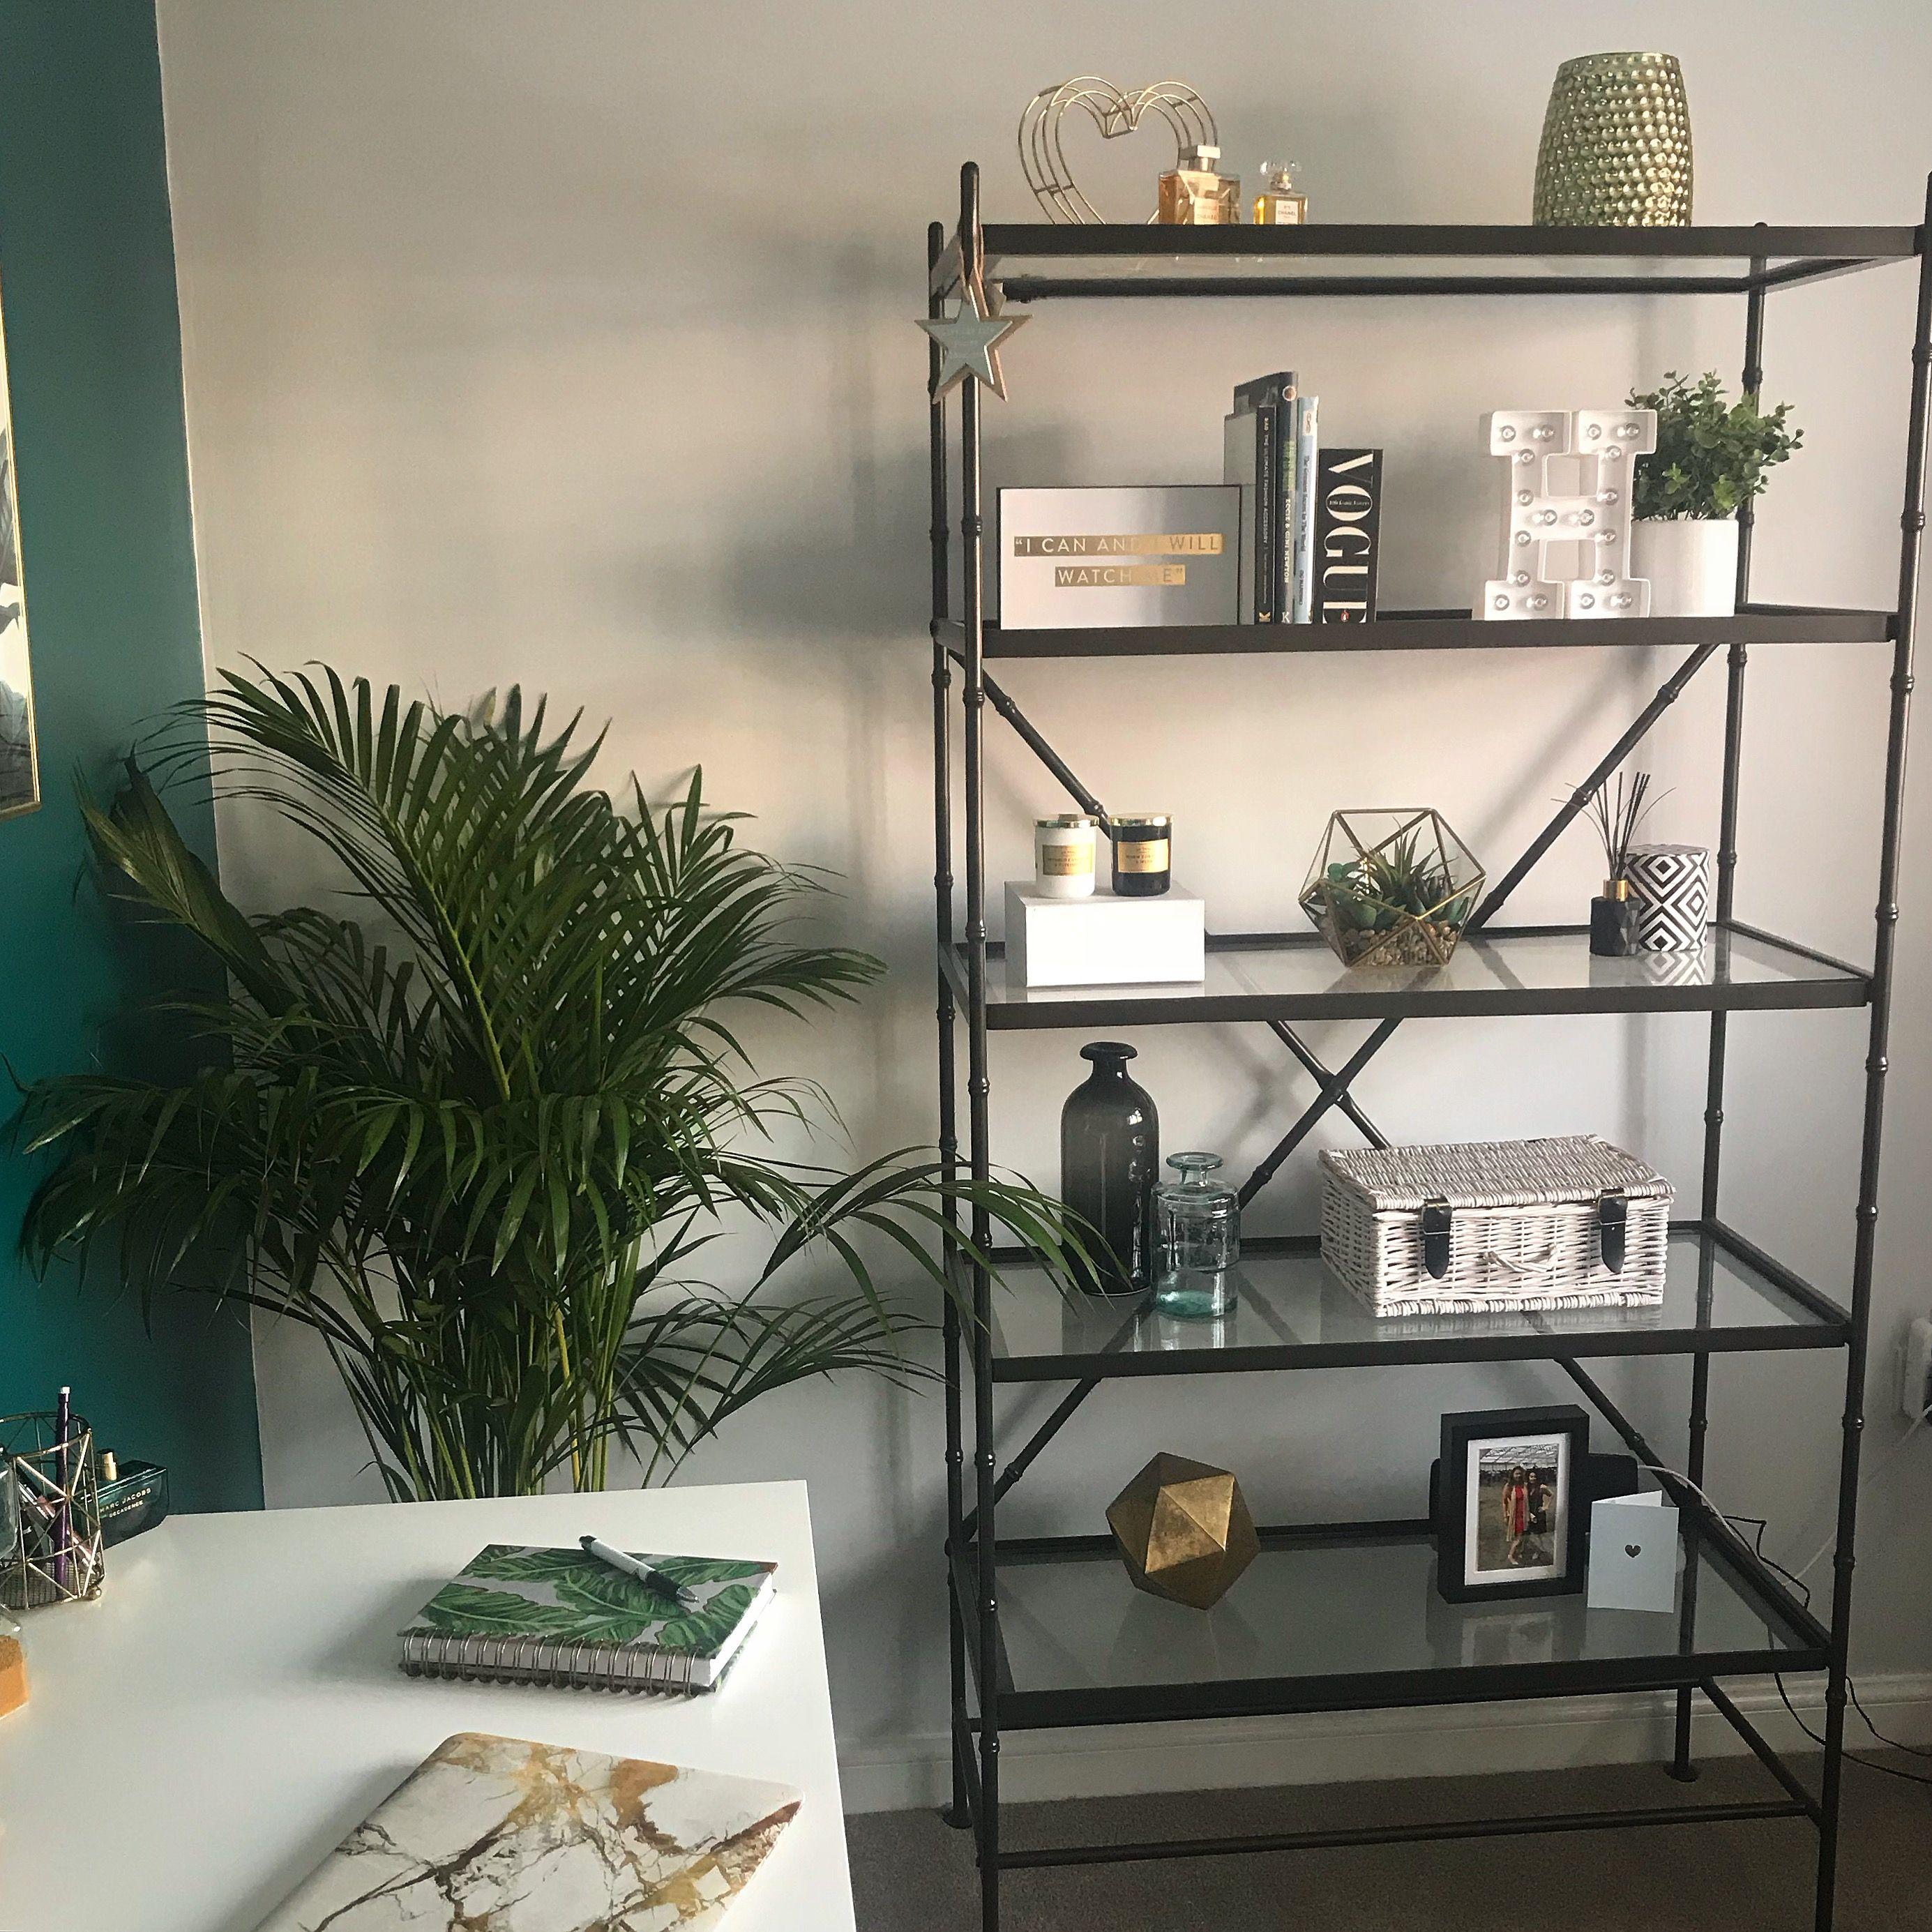 like plant a letter decorate decoration decor ideas shelving pro bookshelf to lantern and how